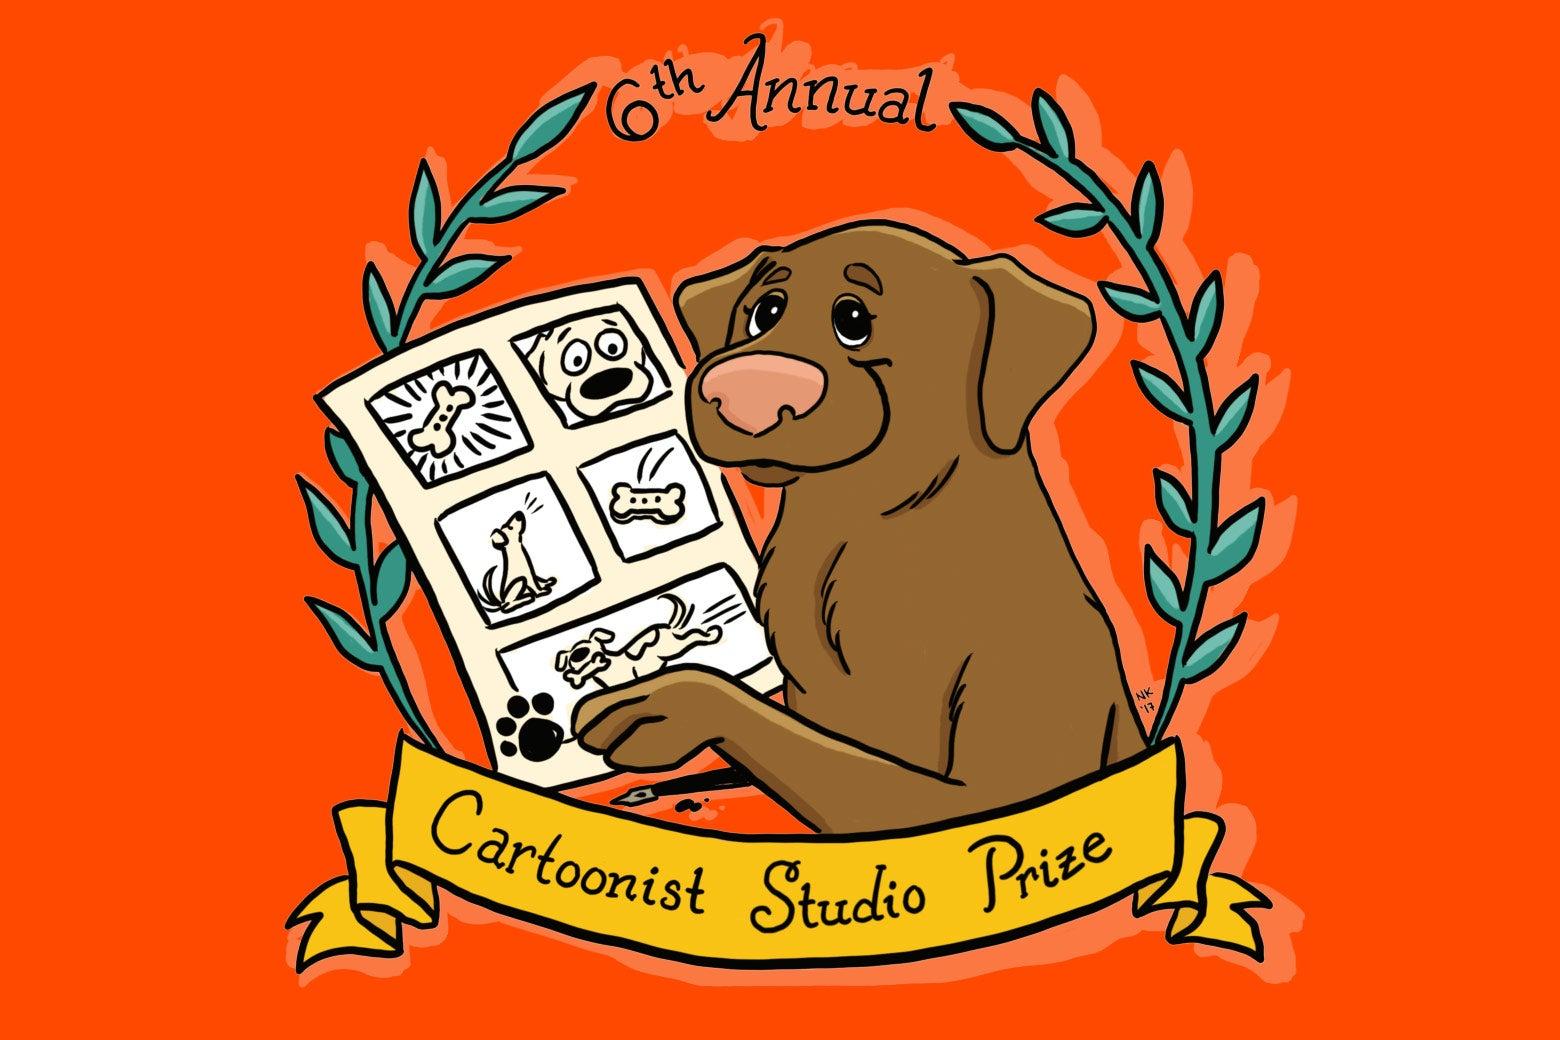 The Cartoonist Studio Prize logo